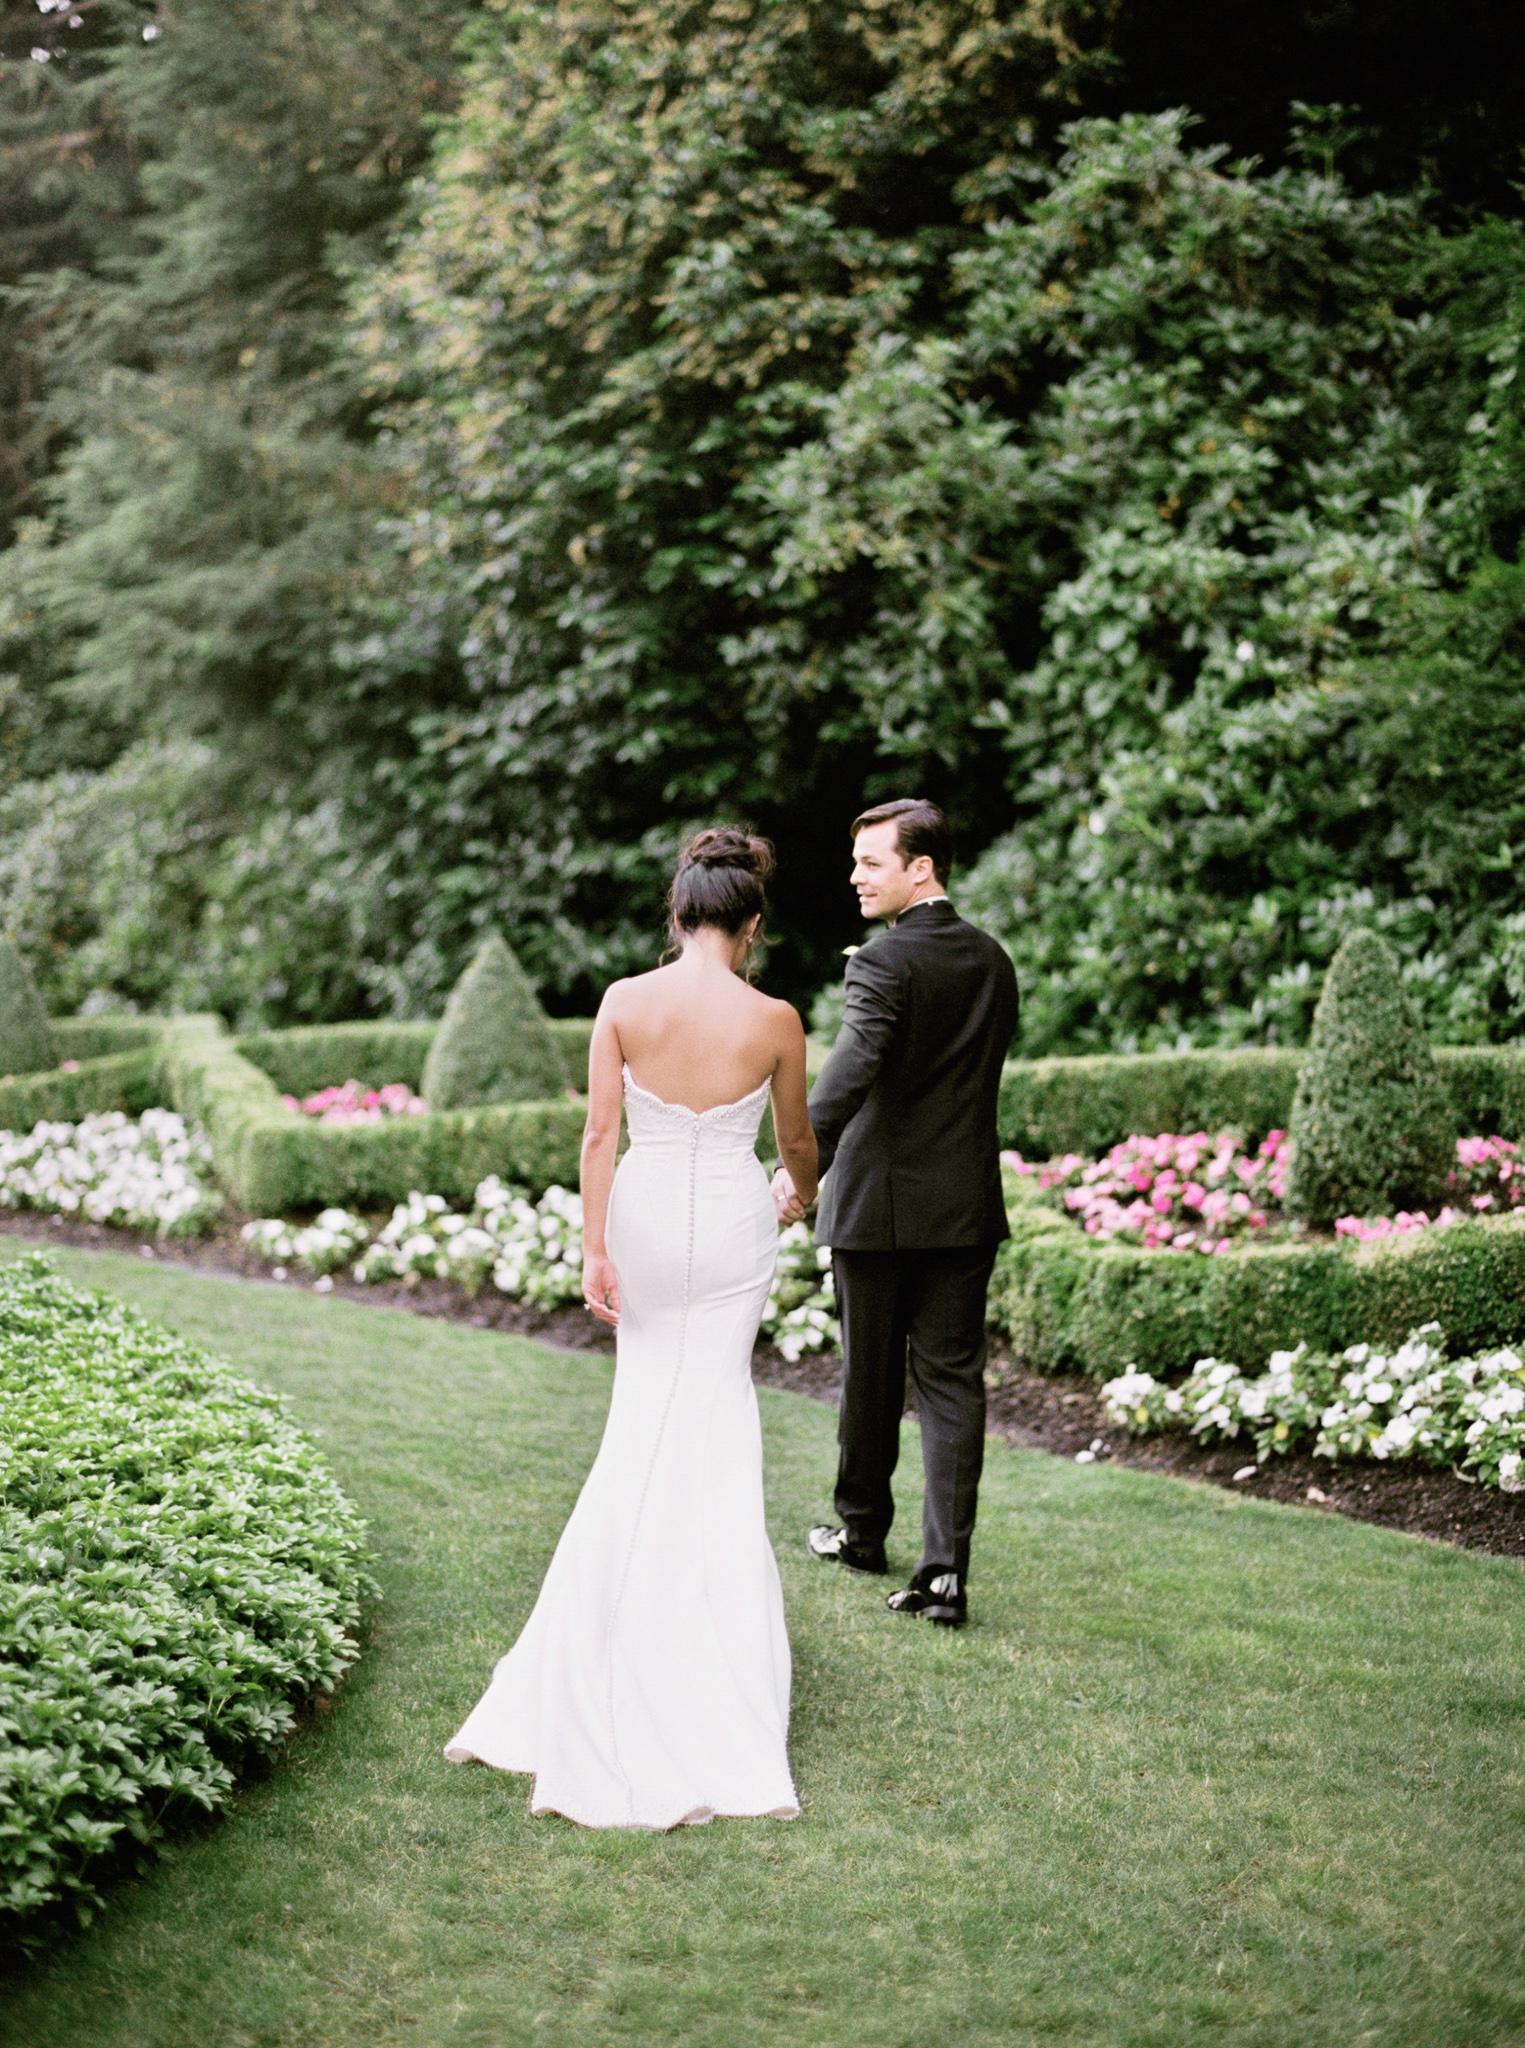 104OutliveCreative_Travel_Photographer_Videographer_Lewis&Clark_Oregon_Elegant_BlackTie_Destination_Wedding.jpg